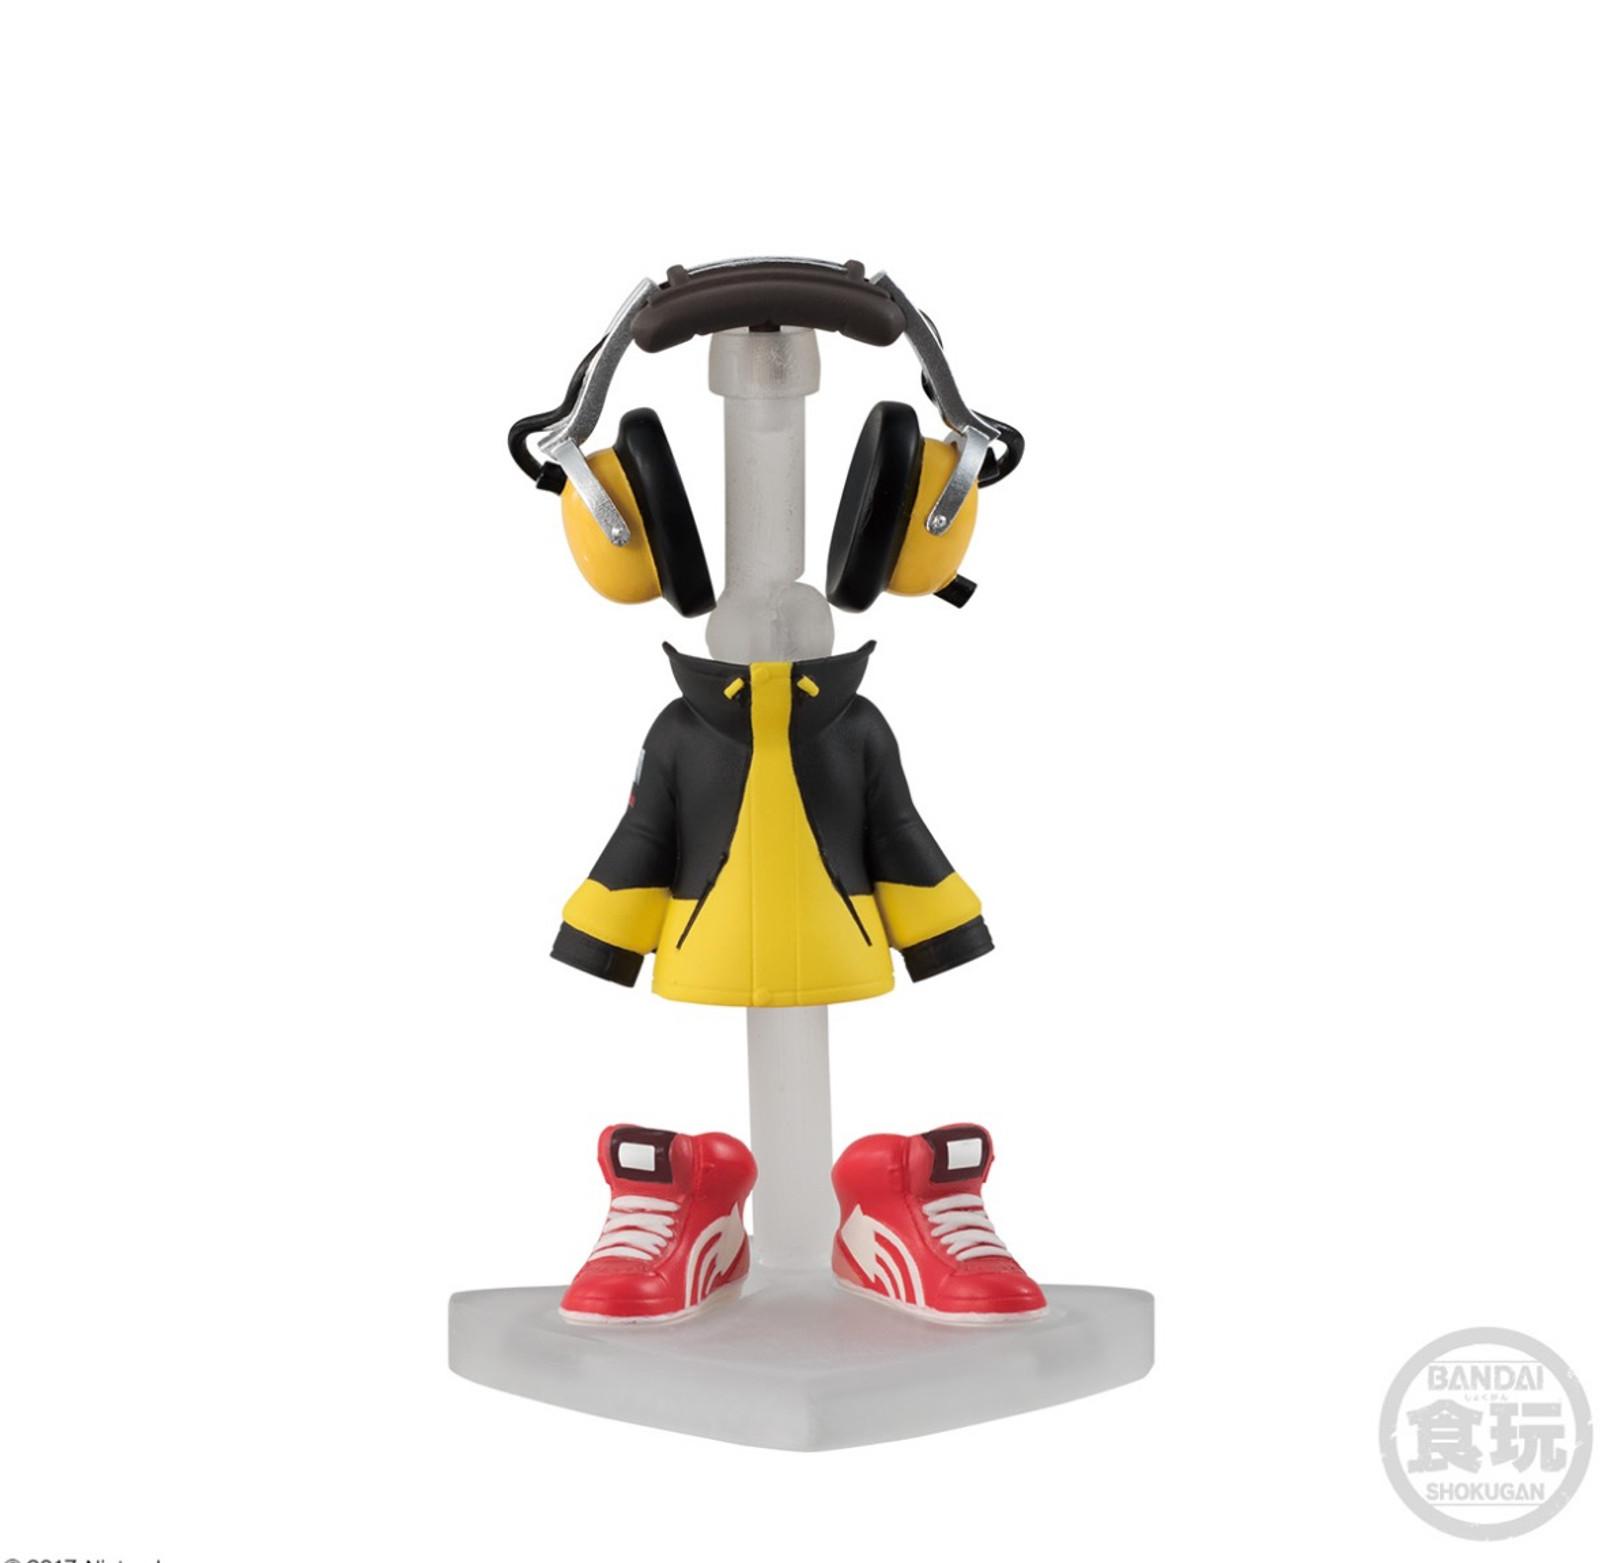 Splatoon 2 Dress-up Figure Gear Collection GEAR Set #4 JAPAN Nintendo Switch